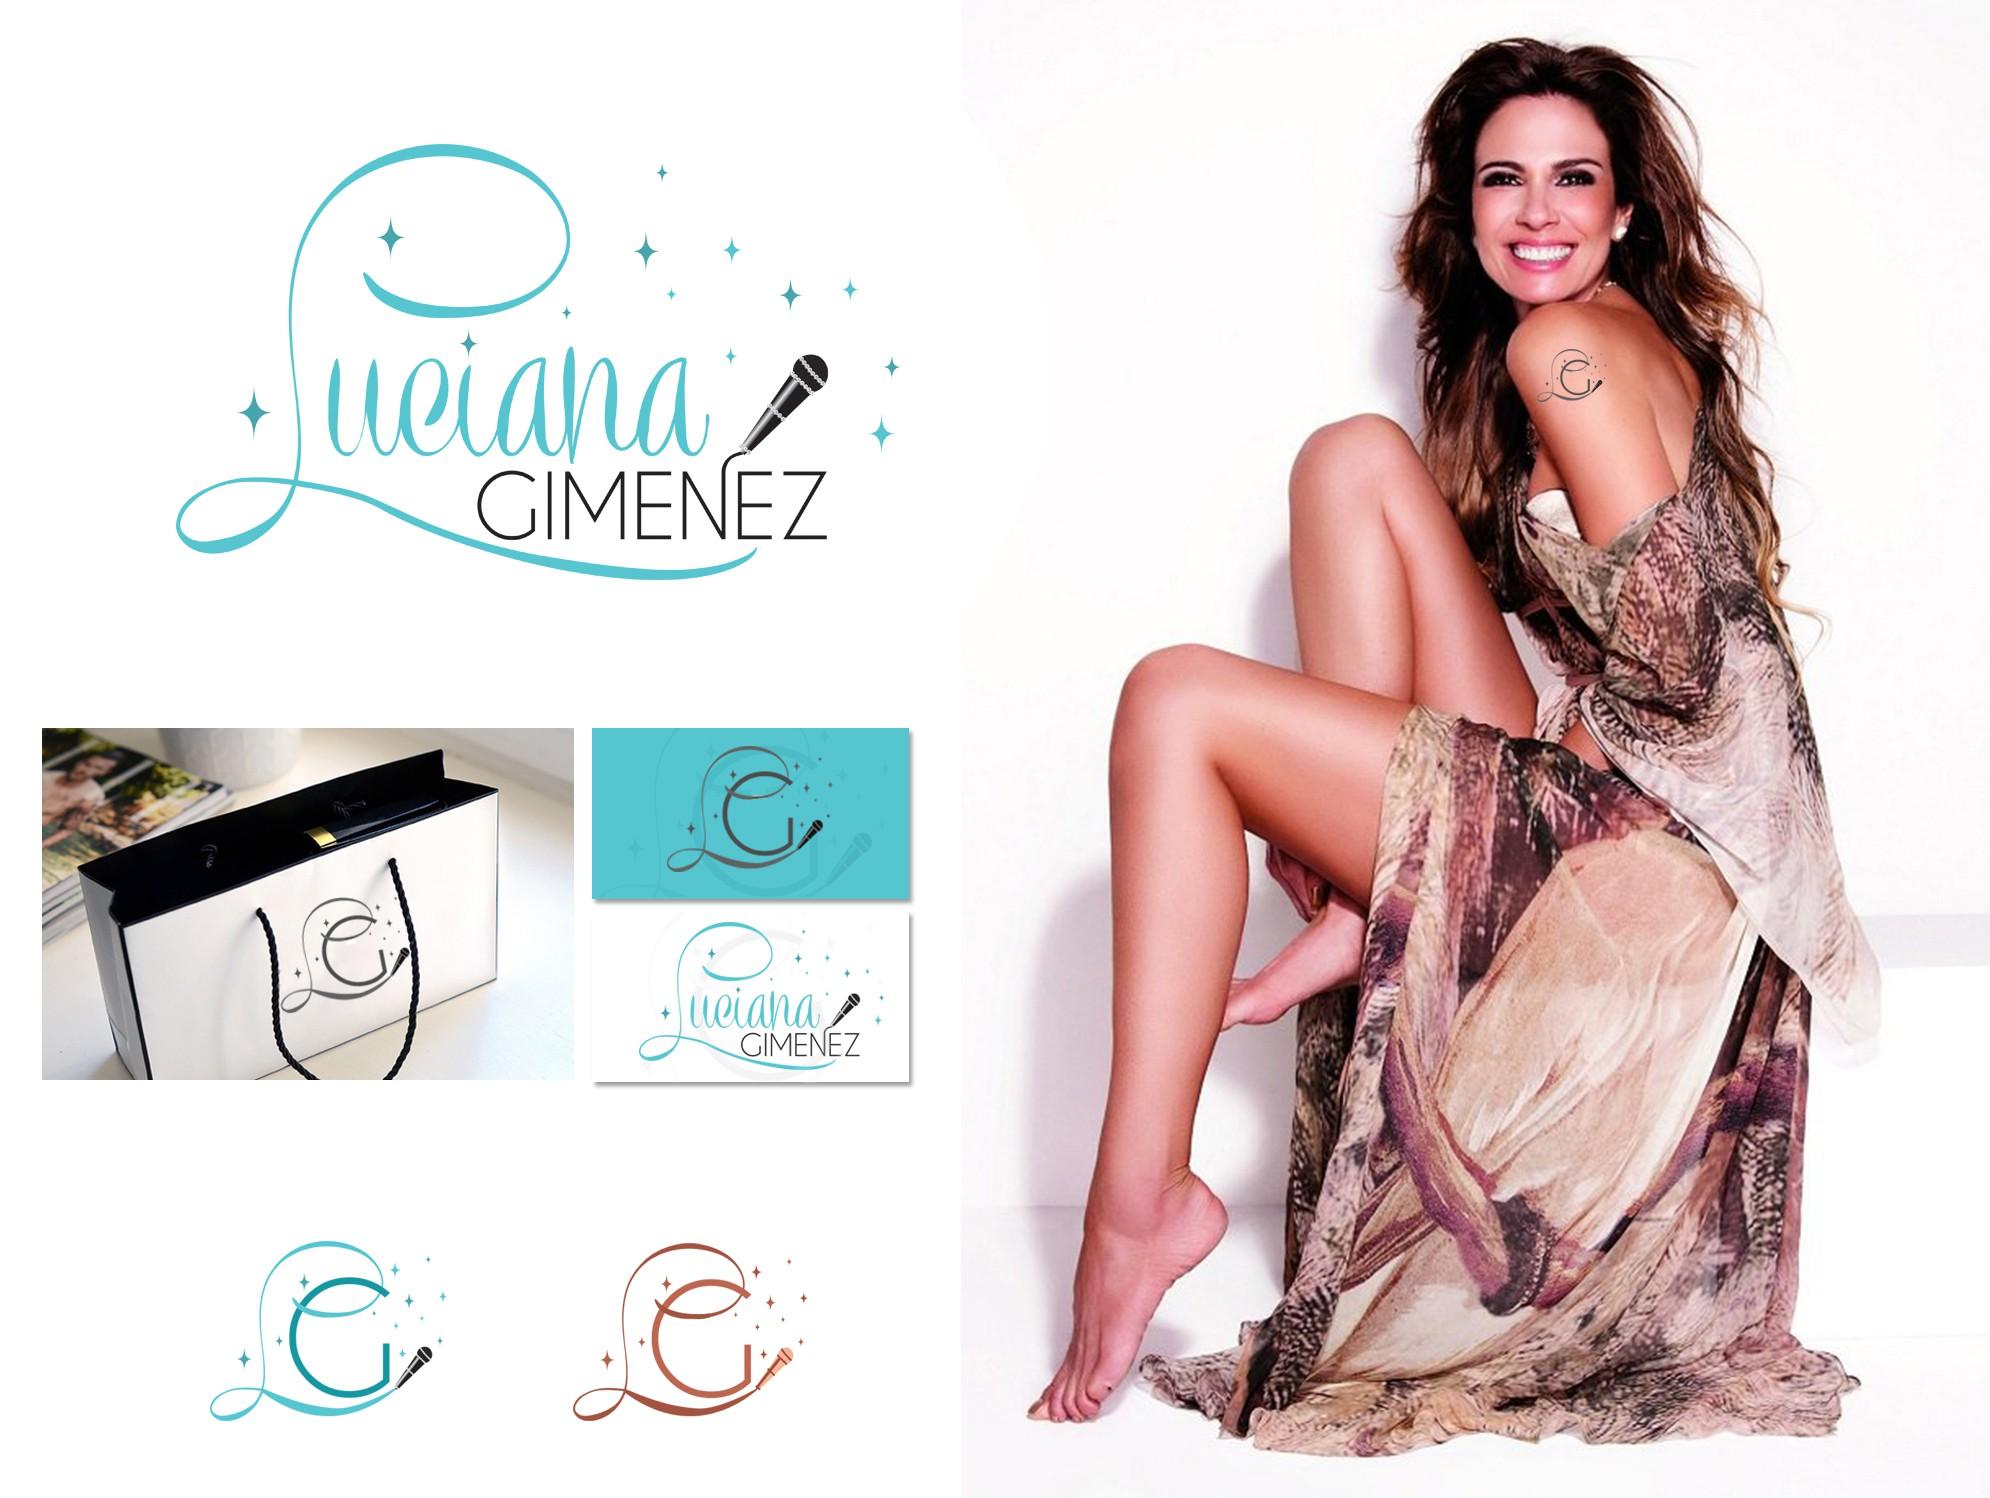 logo for luciana gimenez